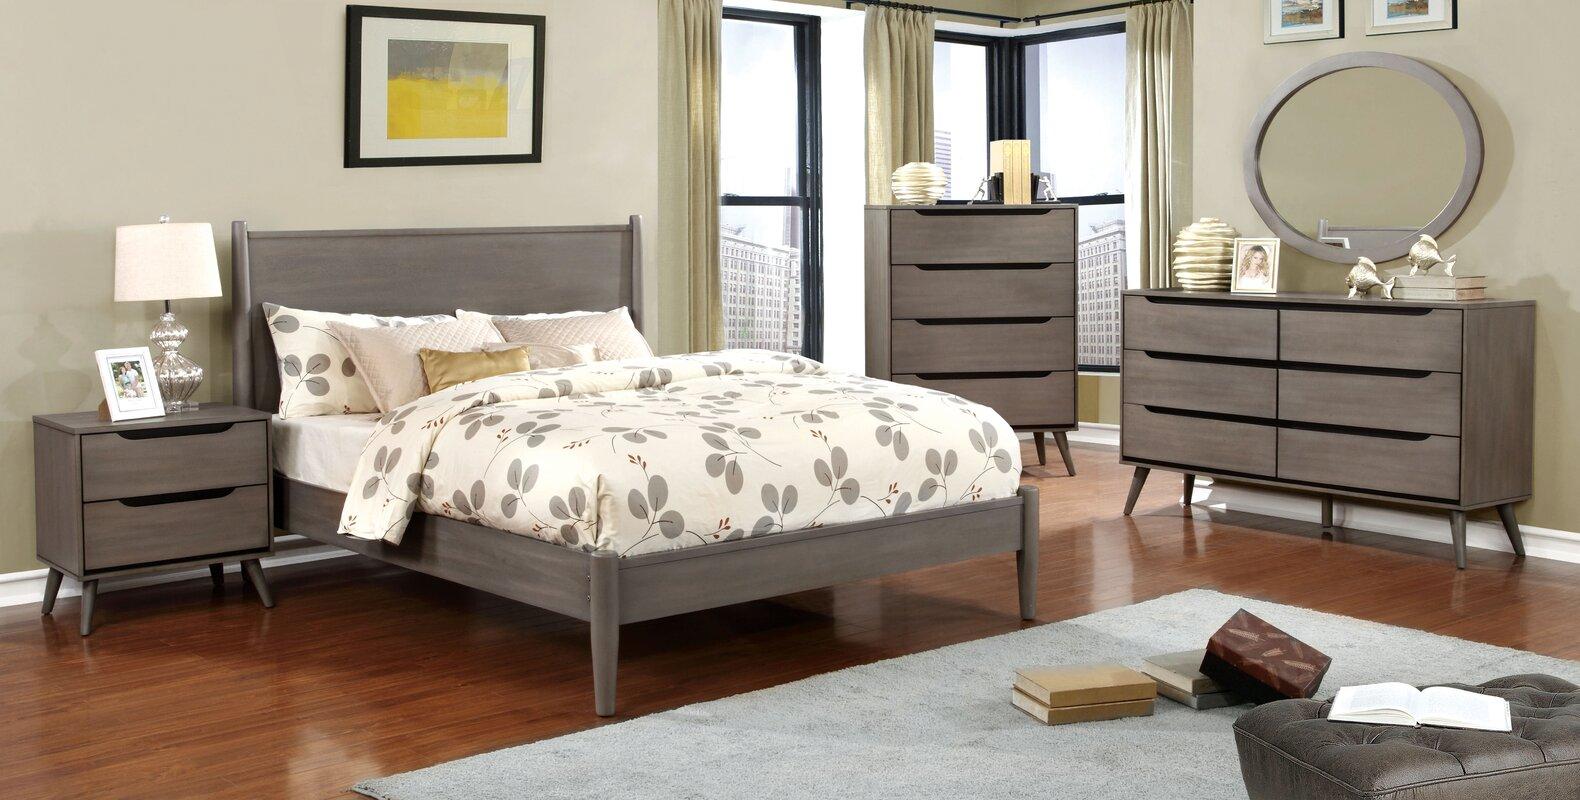 Default nameMercury Row Mason Mid Century Modern Platform Bed   Reviews   Wayfair. Fujian 3 Piece Queen Size Platform Bedroom Set. Home Design Ideas